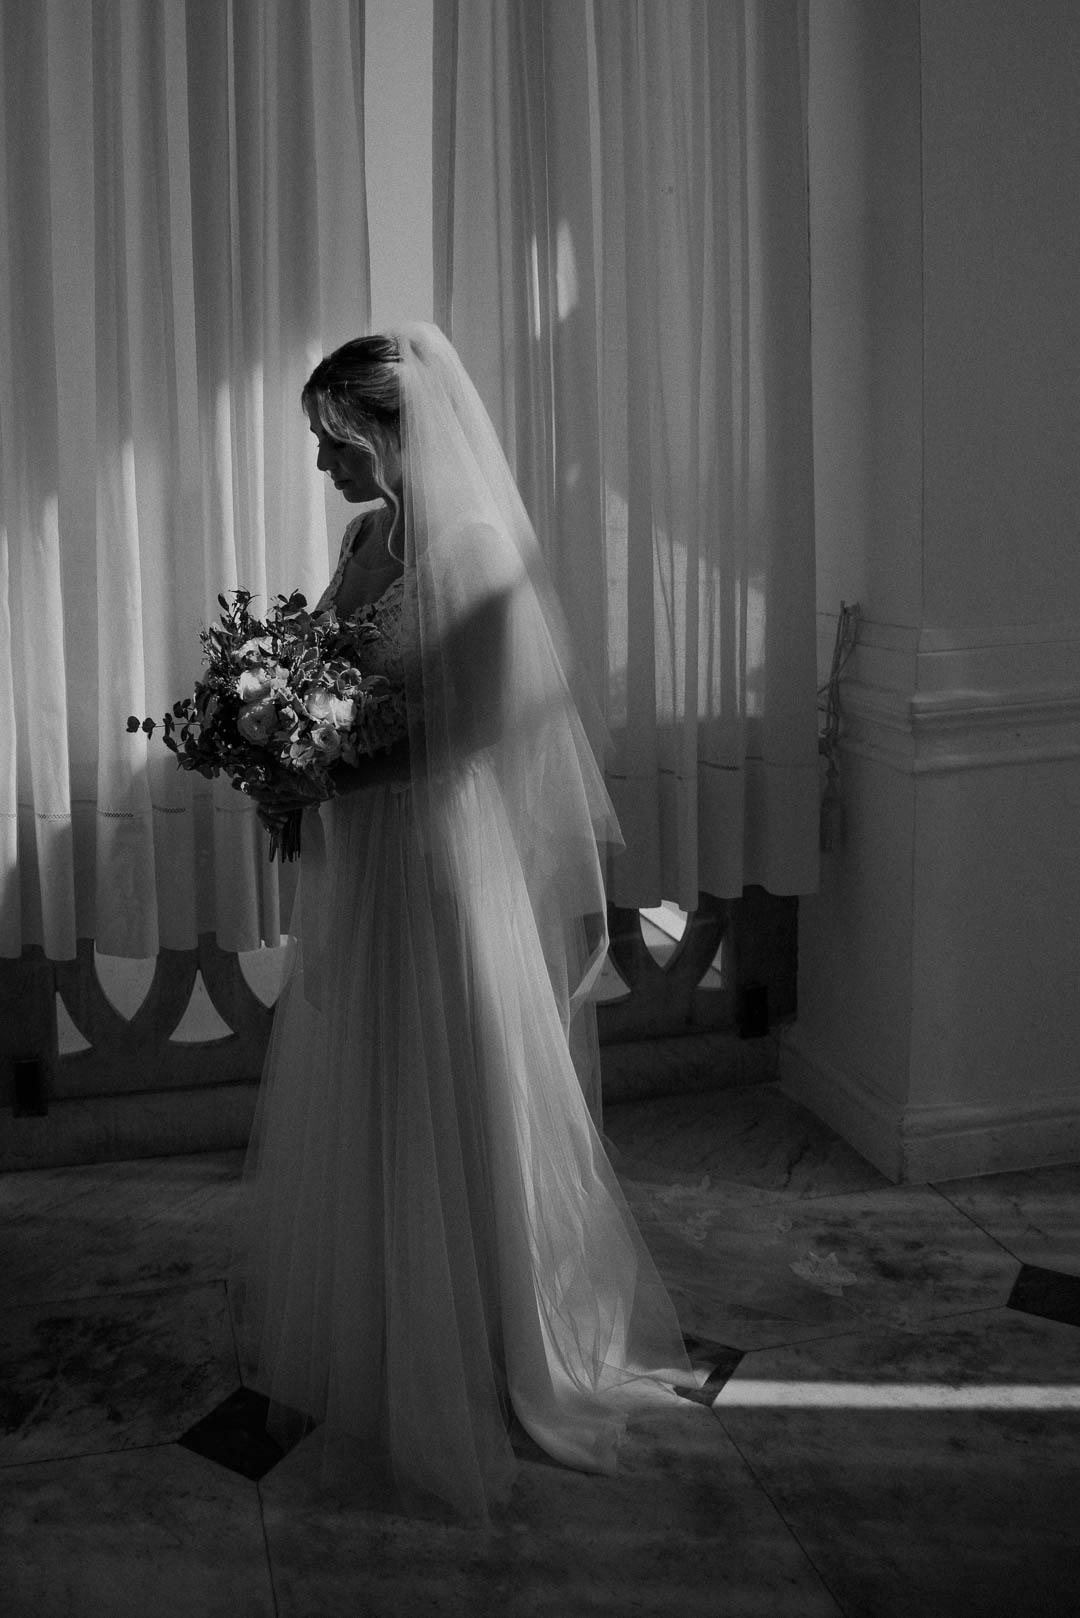 vivianeizzo-spazio46-wedding-photographer-destination-reportage-napoli-villacilento-15